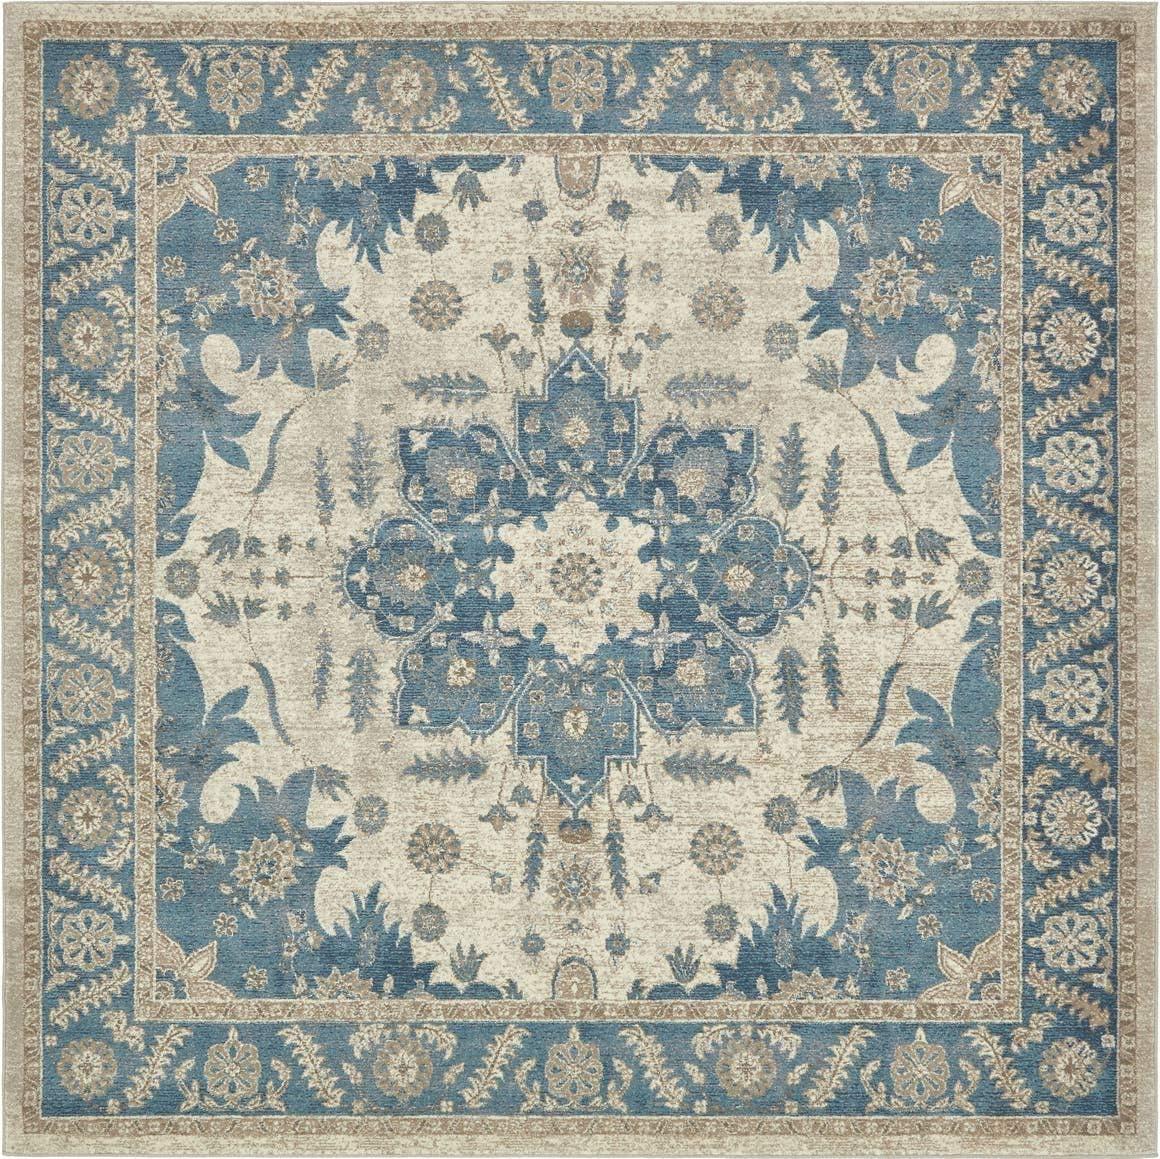 Unique Loom Salzburg Collection Traditional Oriental Cream Square Rug 8 0 x 8 0